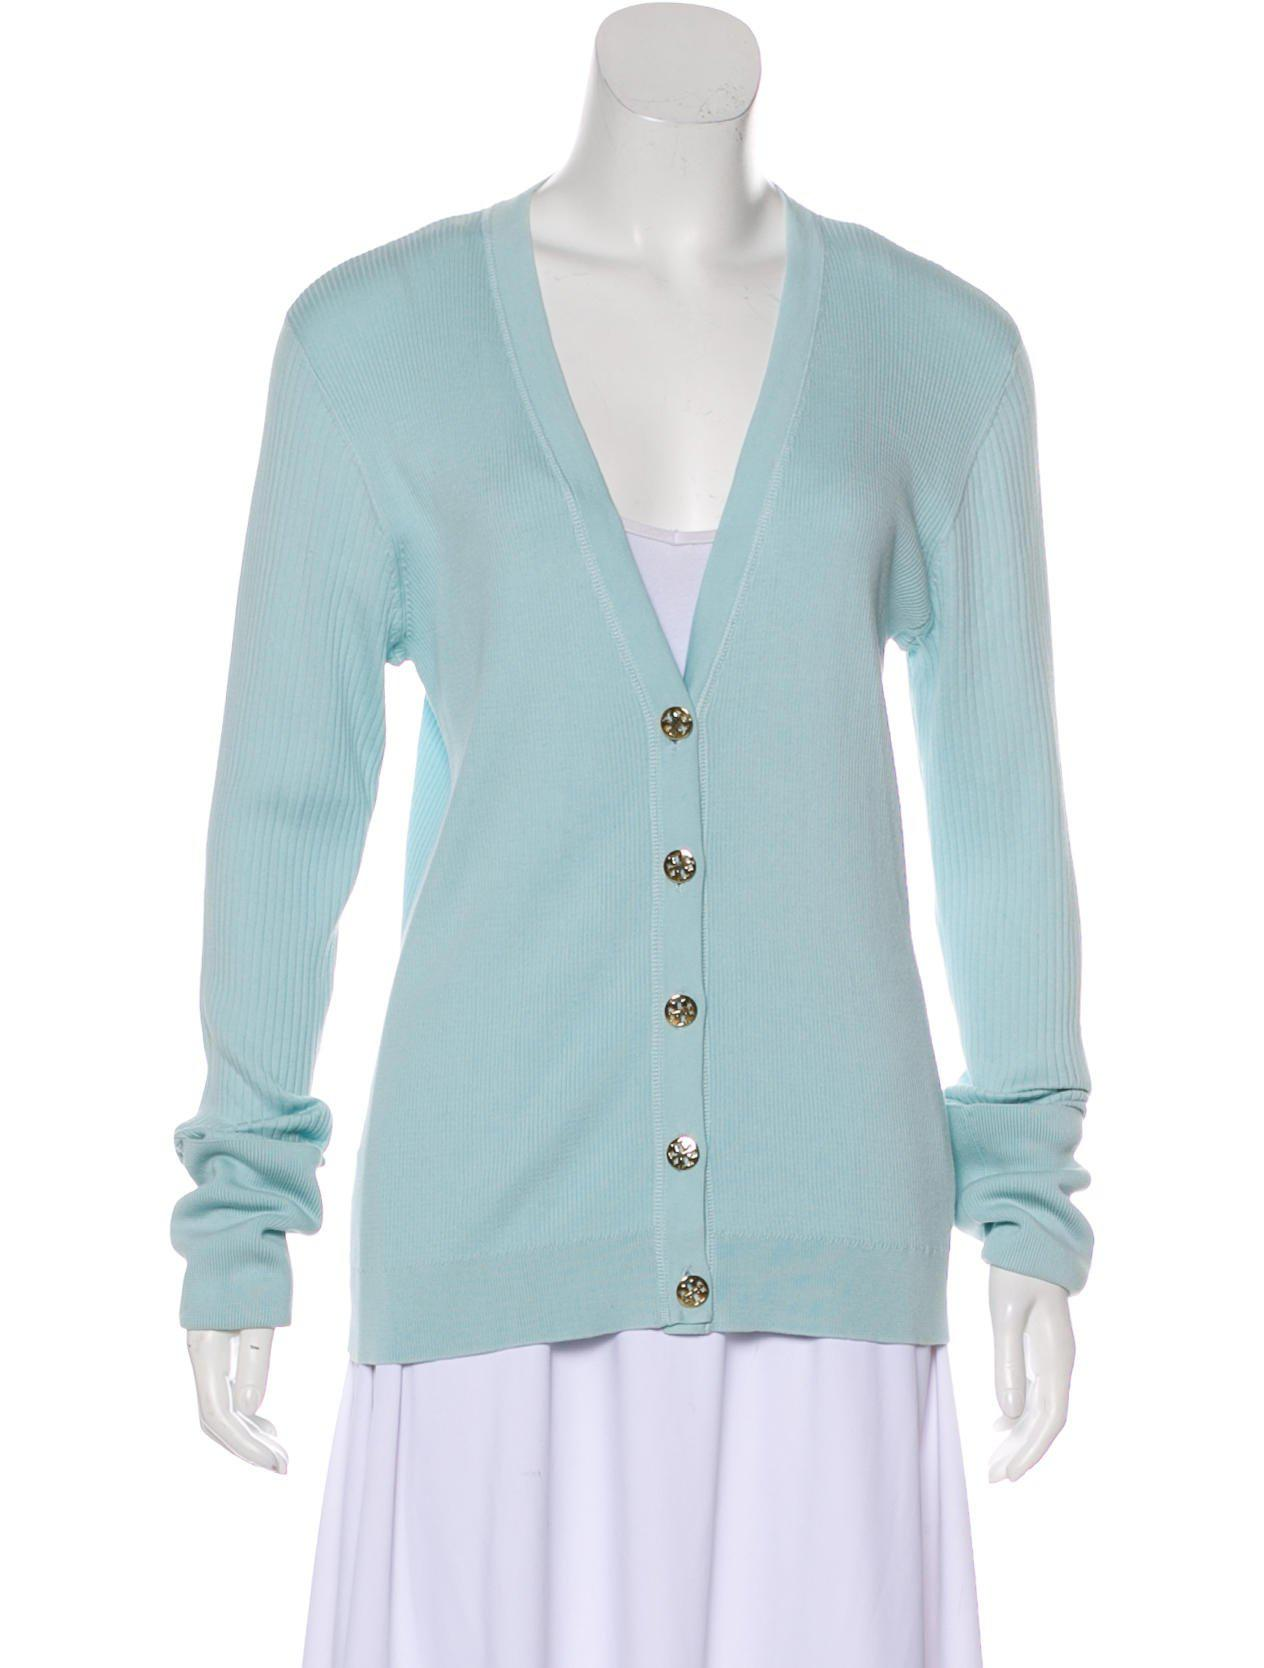 Tory Burch Long Sleeve Knit Cardigan Discount Purchase ToYjFDCQ8